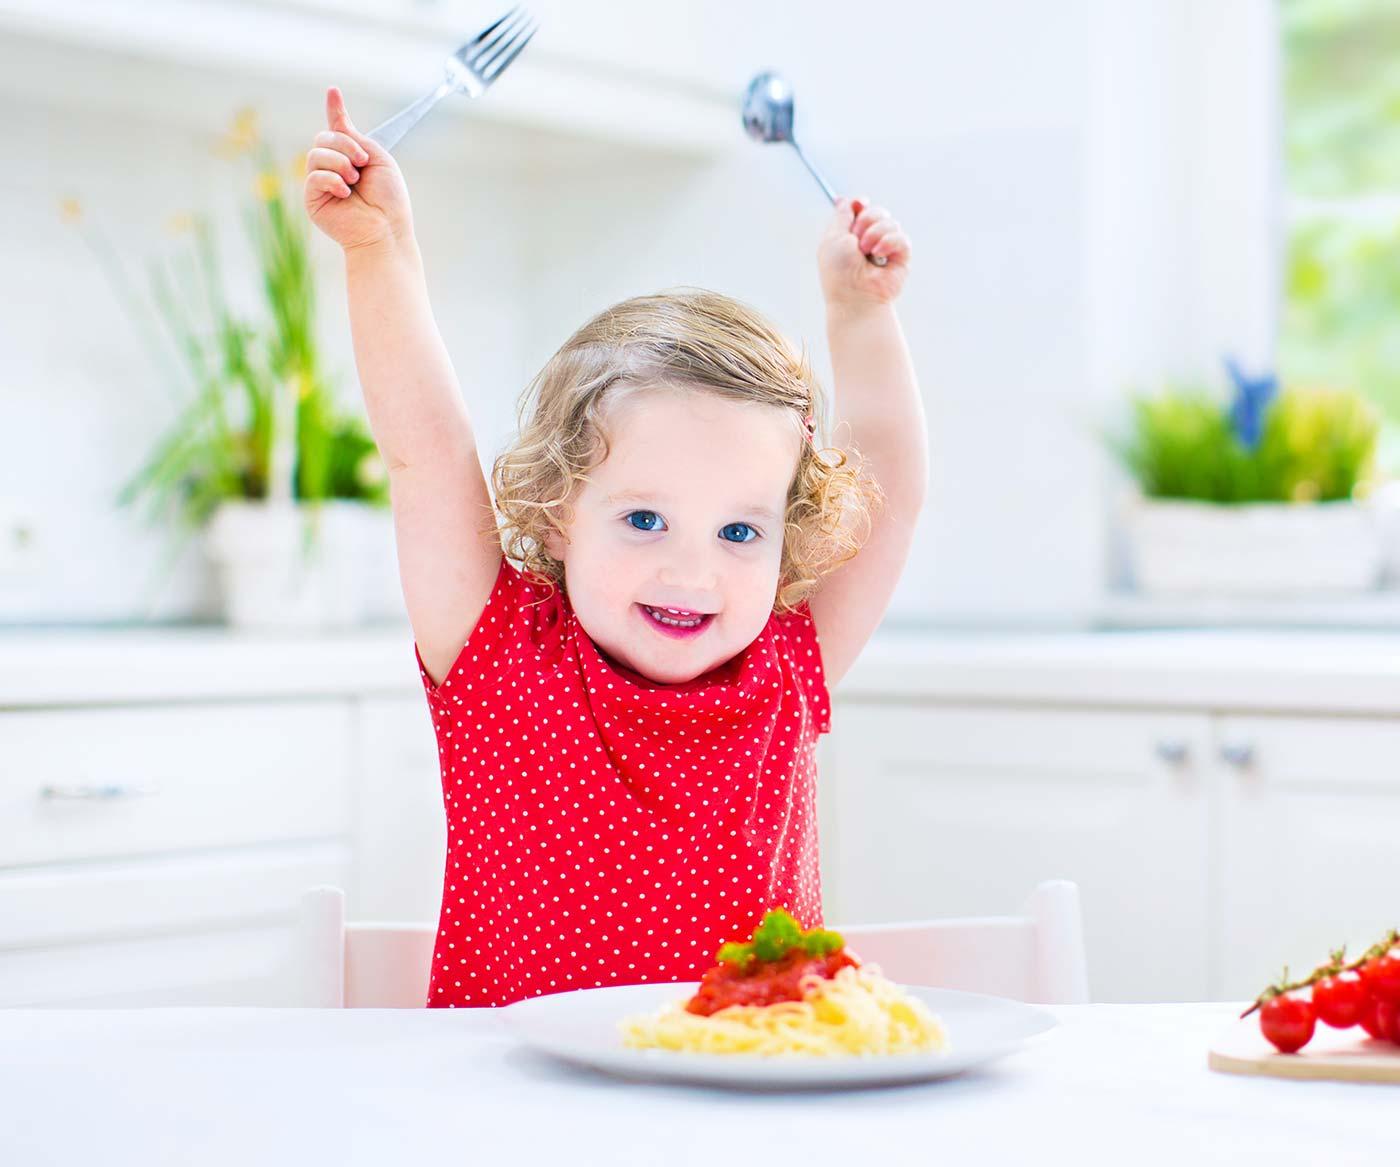 Toddler girl happy to eat spaghetti